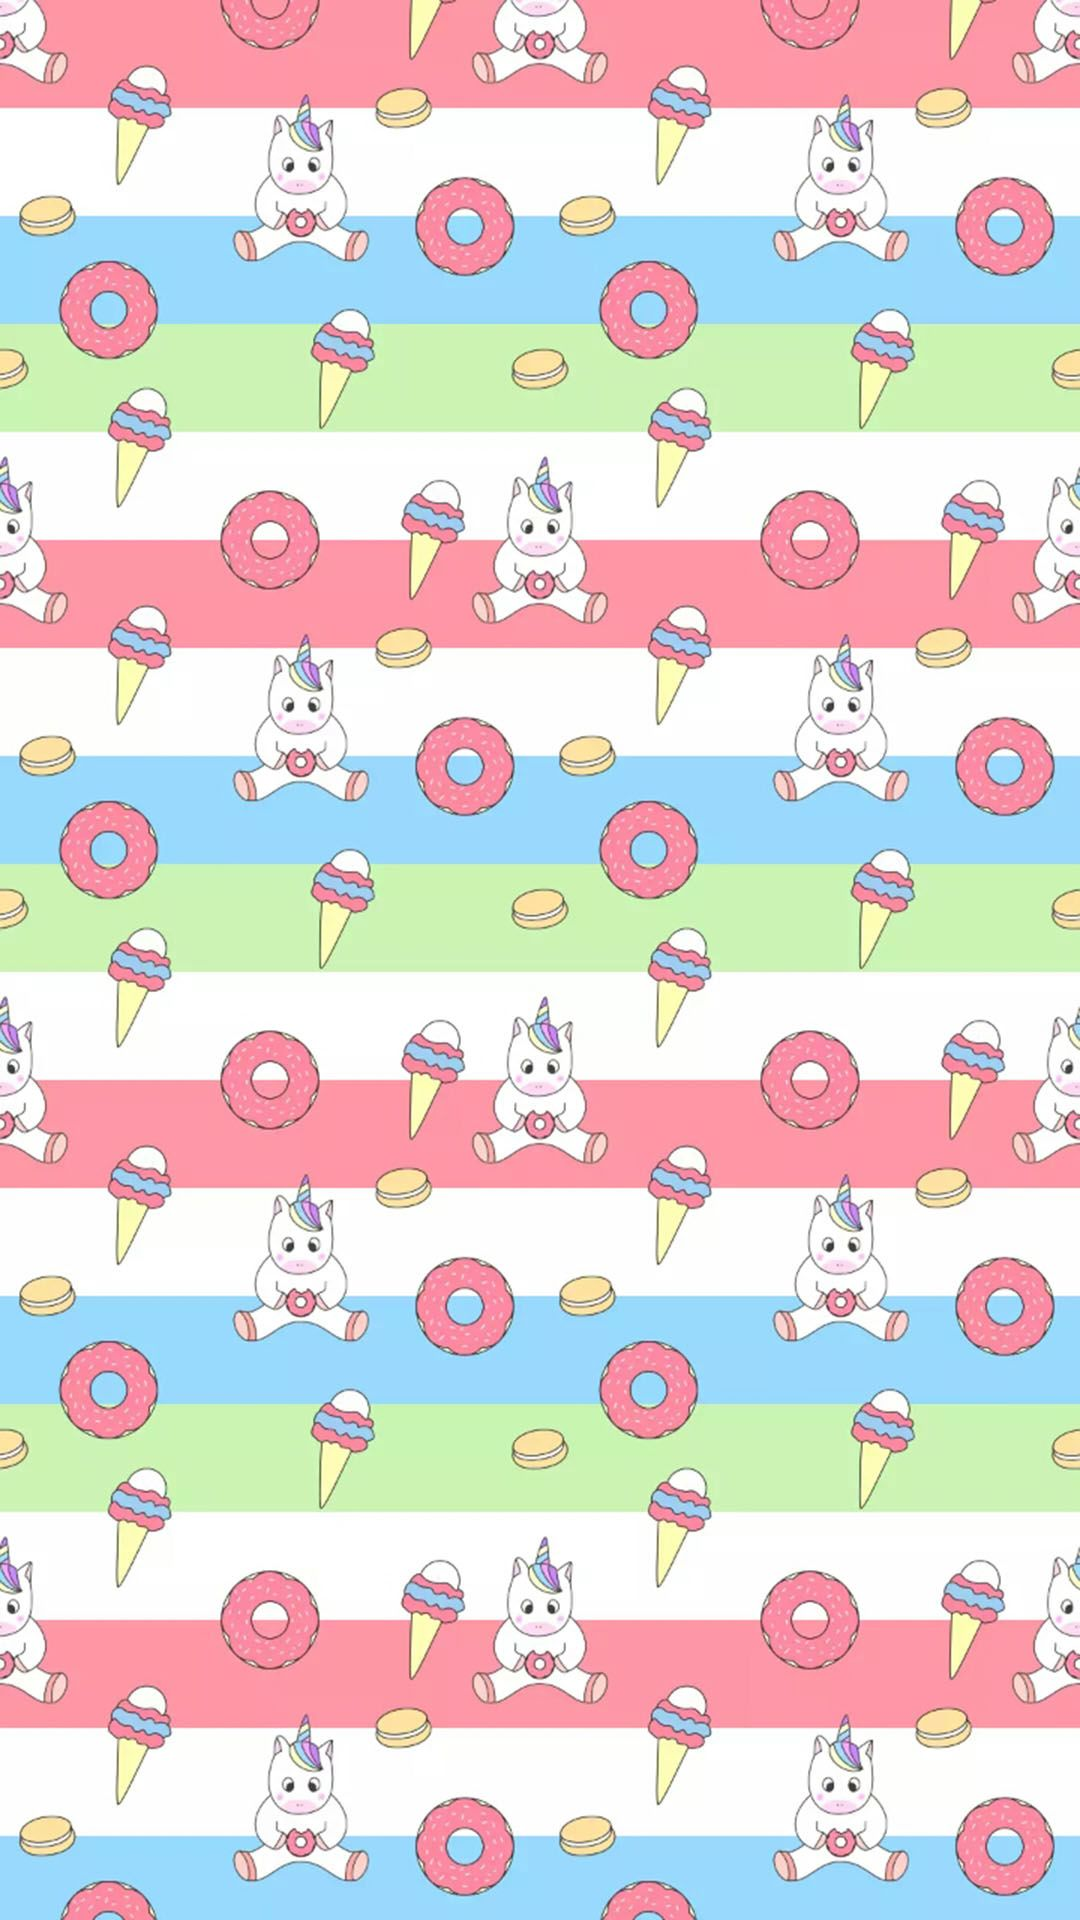 Download The Best Cute Kawaii Wallpapers App Now Itms Apps Itunes Apple Com App Id1551471572 In 2021 Kawaii Wallpaper Cute Wallpapers Soft Dolls